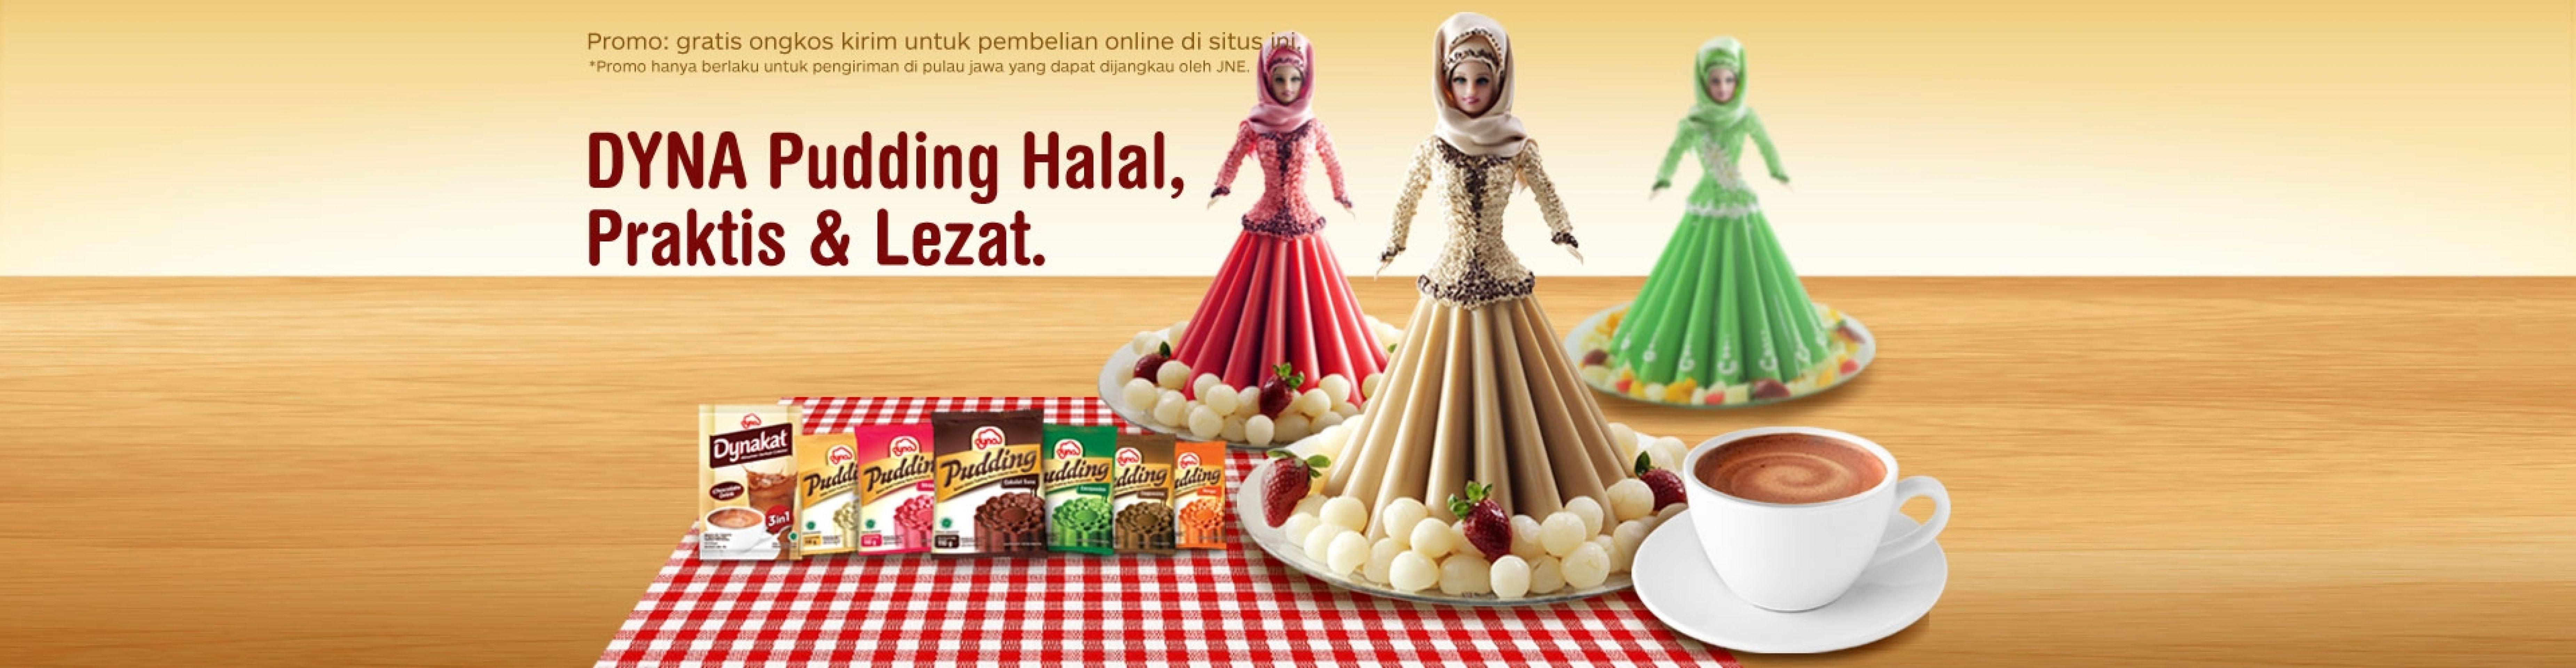 Dyna Pudding Halal, Praktis, dan Lezat